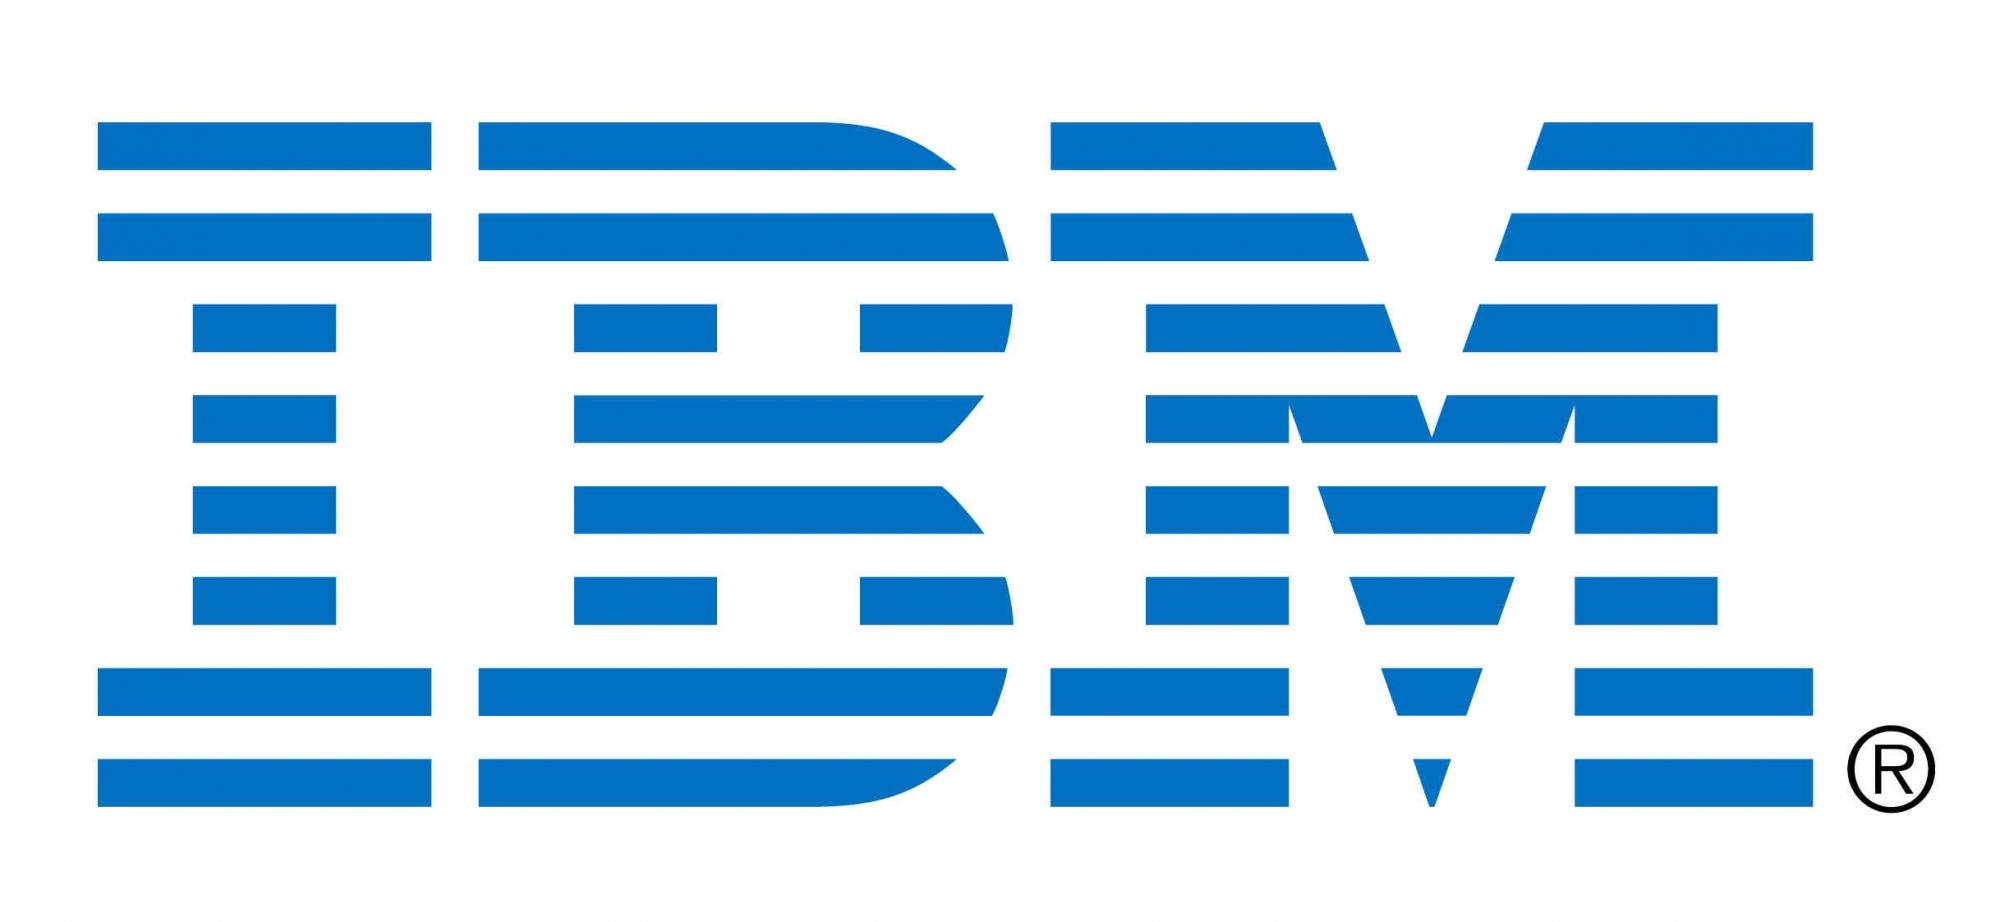 ibm hd png transparent ibm hdpng images pluspng